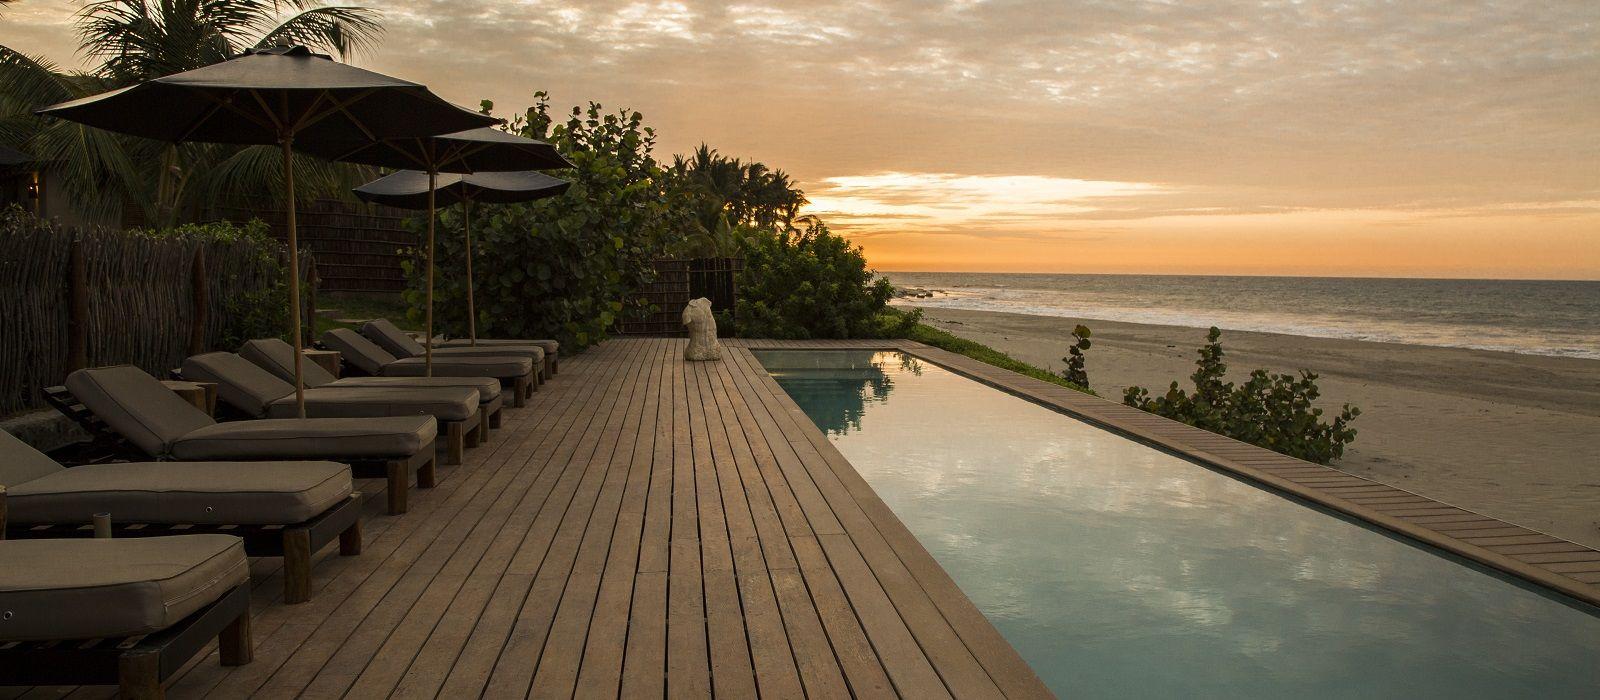 Peru: Luxury Honeymoon and Beach Tour Trip 8